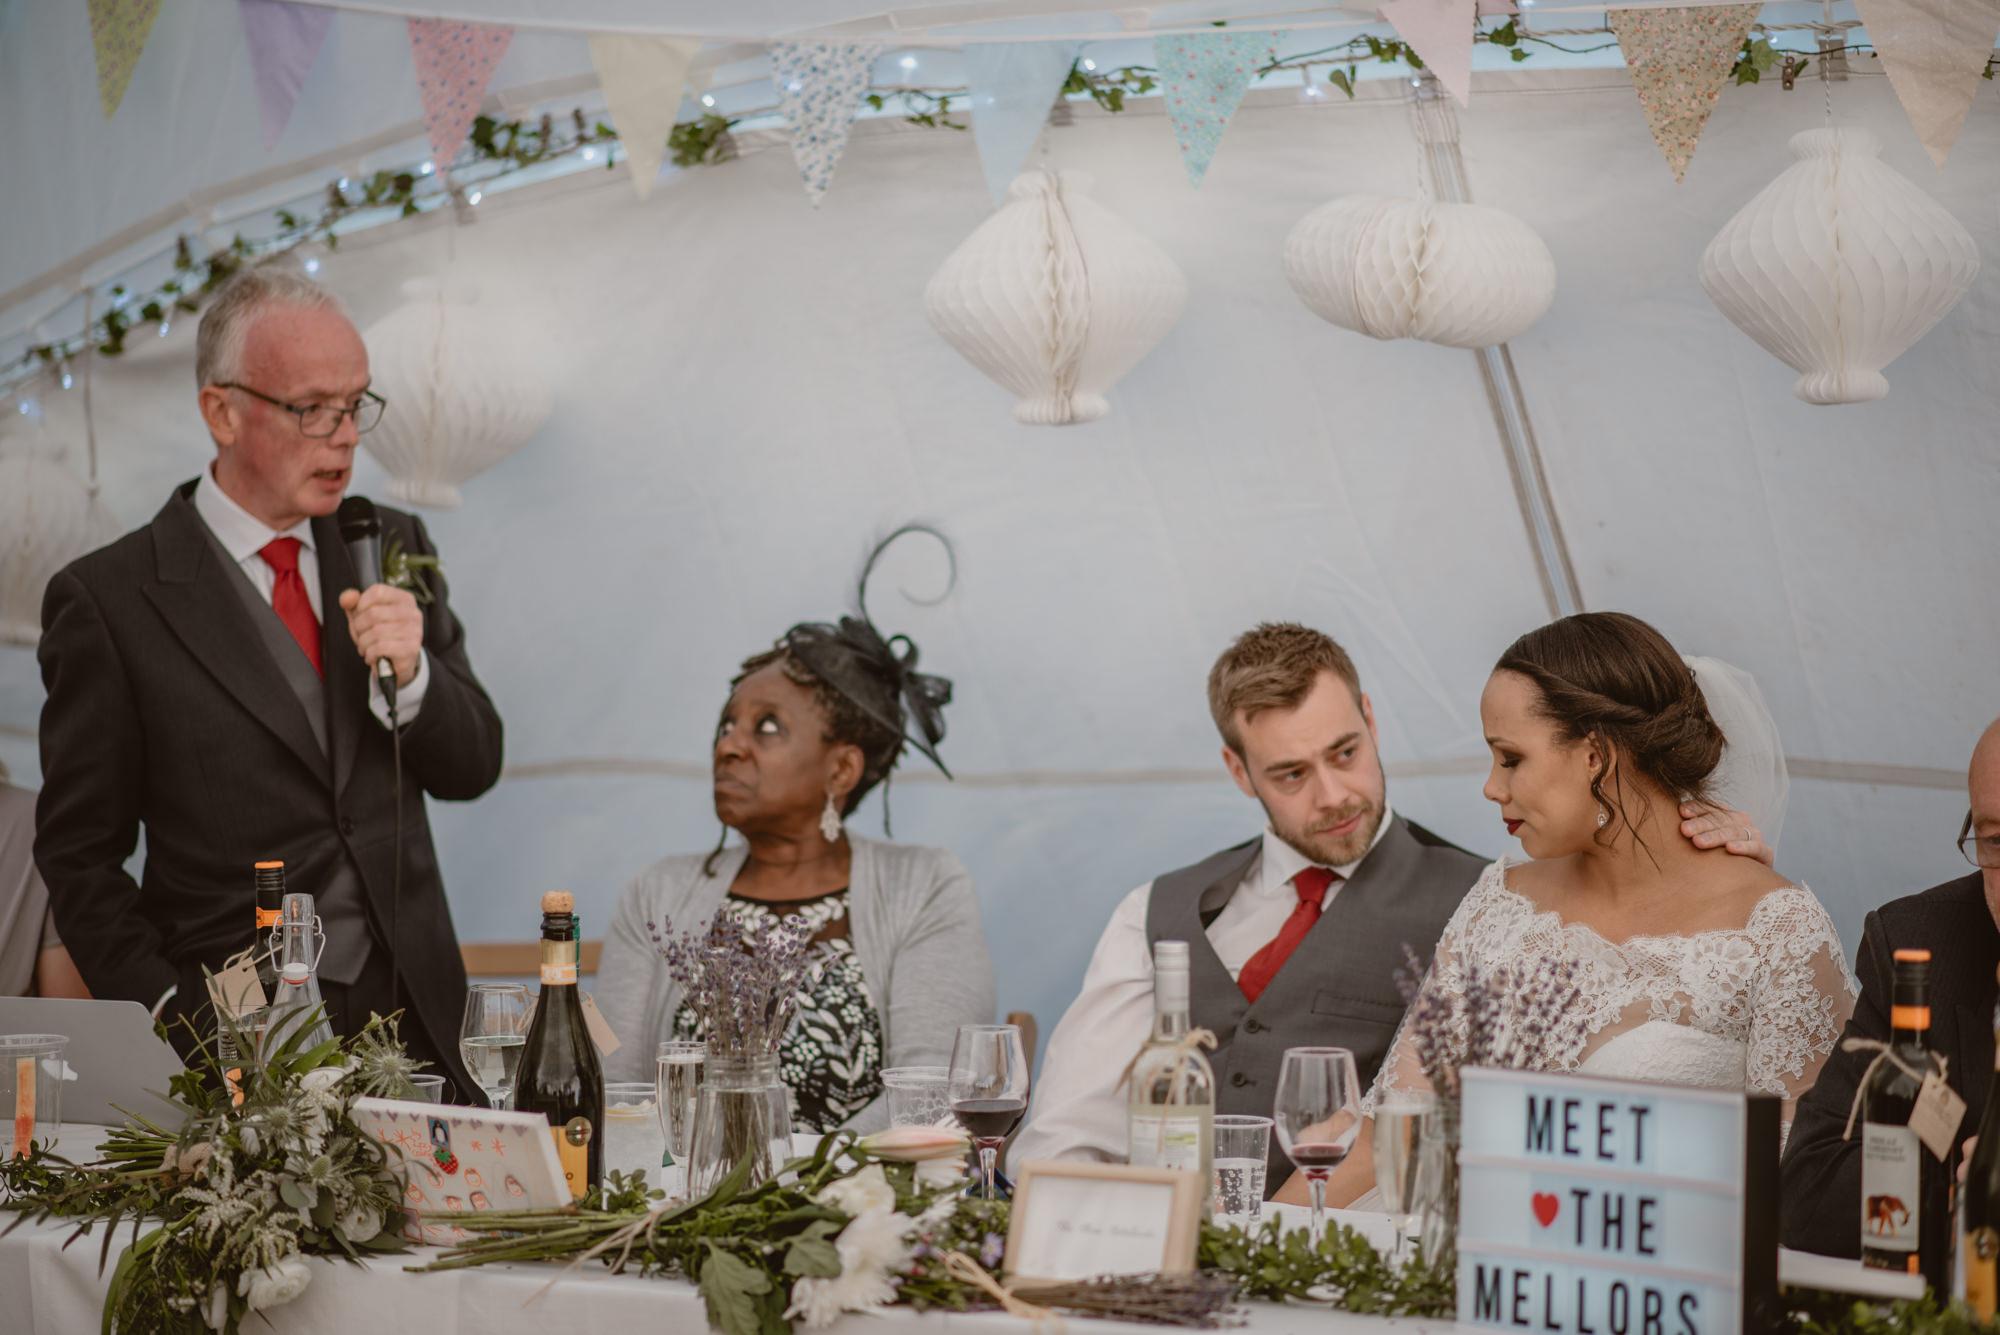 Jacqueline-Gareth-Wedding-Westmead-Events-Surrey-Manu-Mendoza-Wedding-Photography-401.jpg